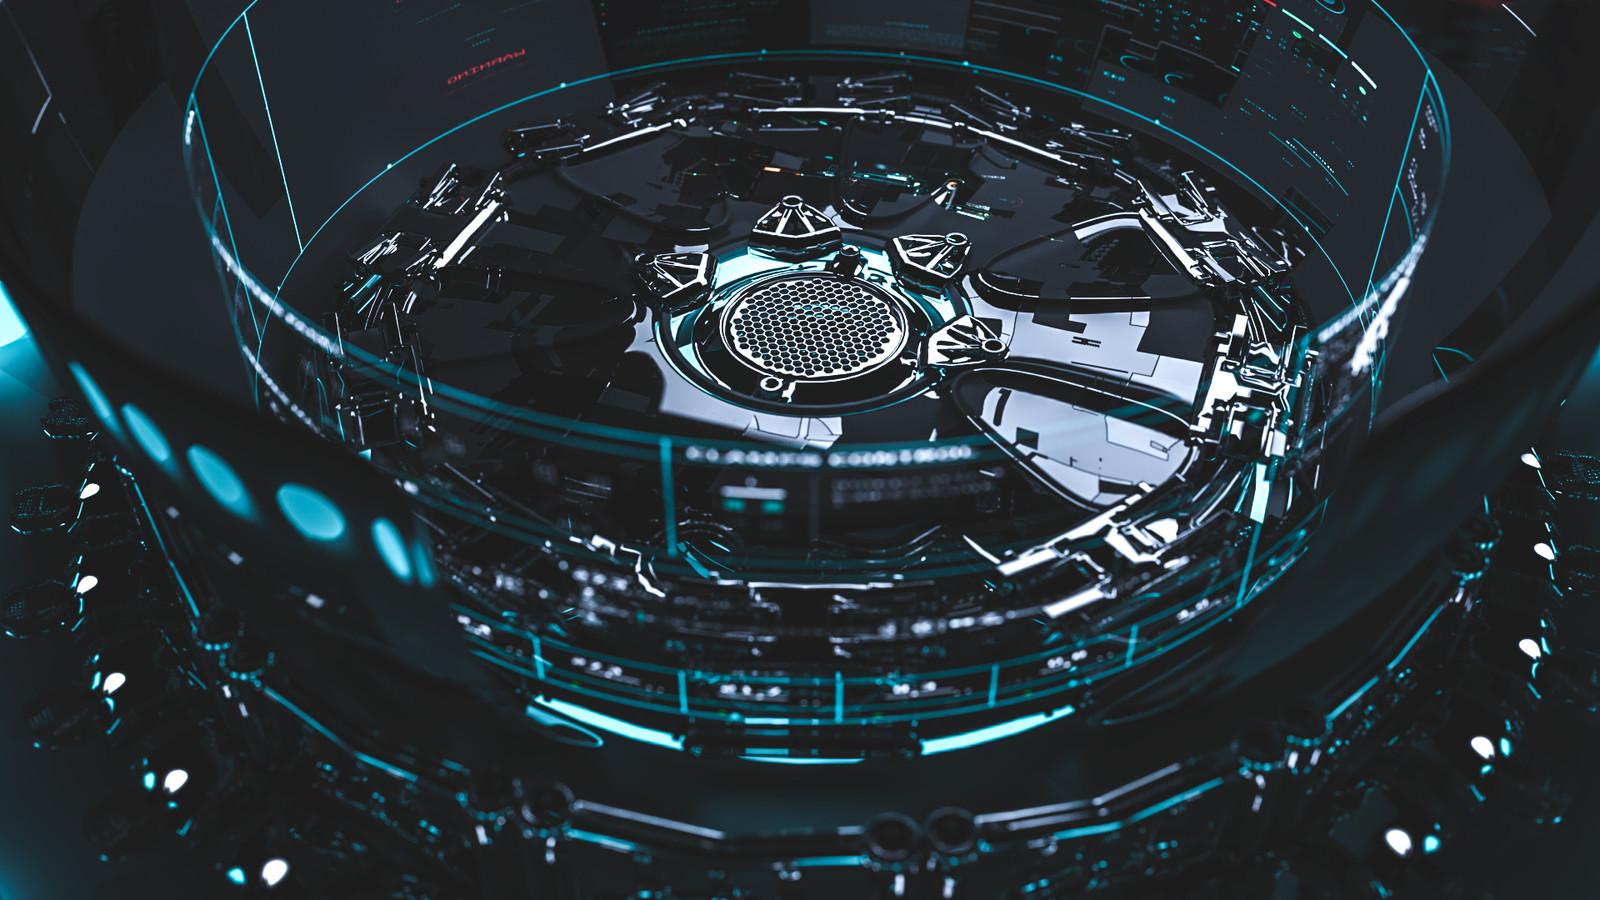 // Portal [RG12_01] Sci fi Concept //